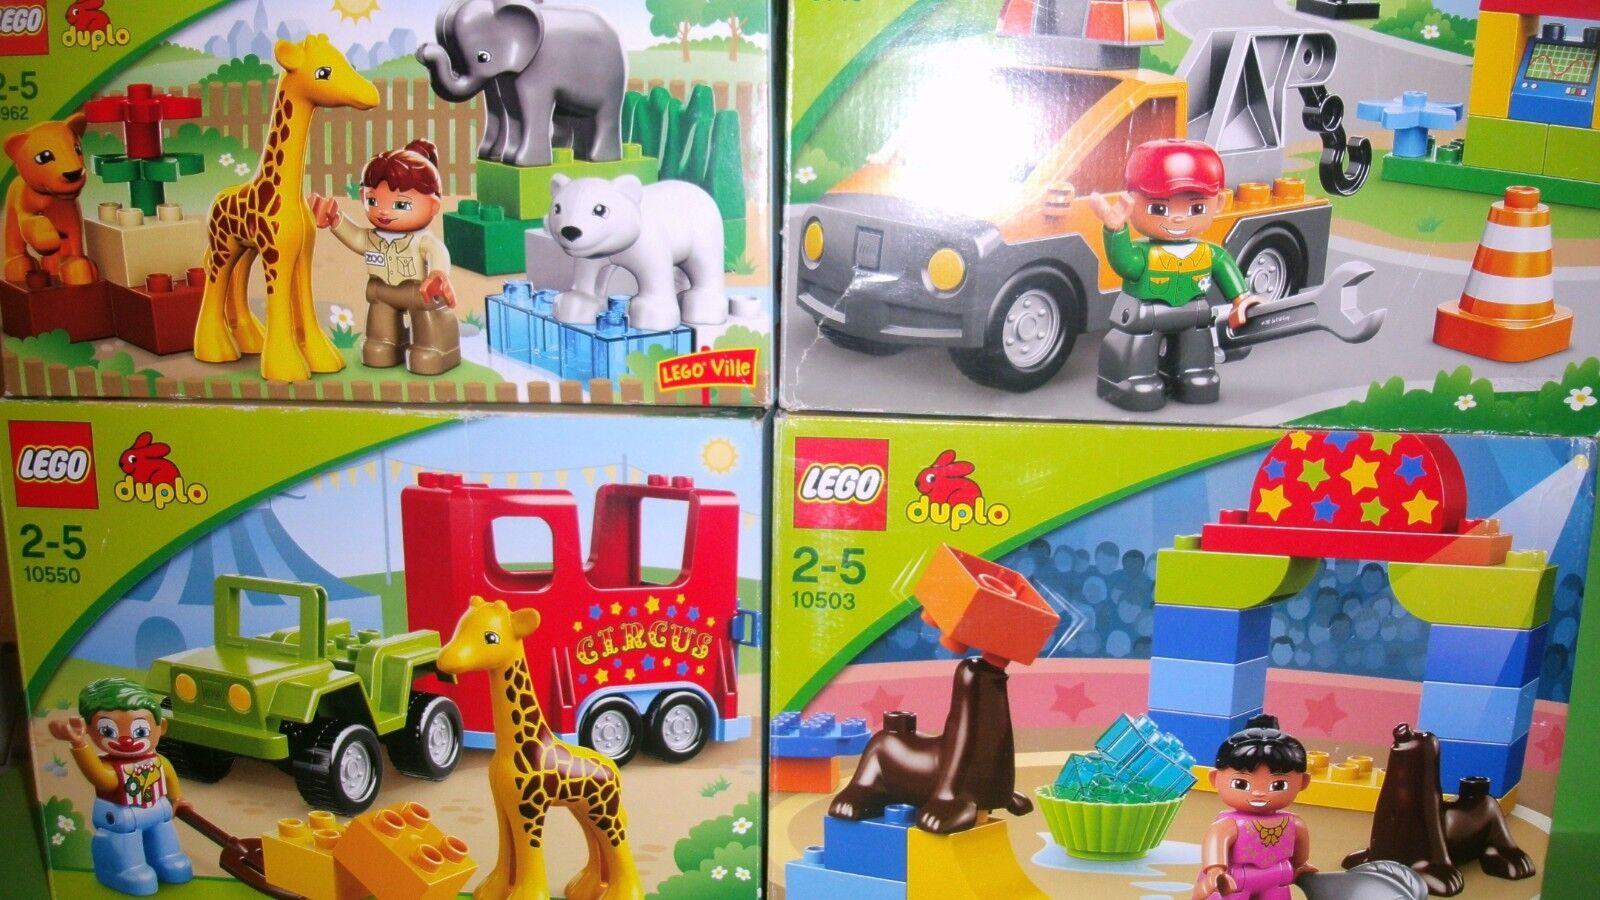 LEGO Duplo 4 4 4 Sets Komplett 10550,10503,4962,6146,Zirkustransporter,Seelöwen,... 37a2ef